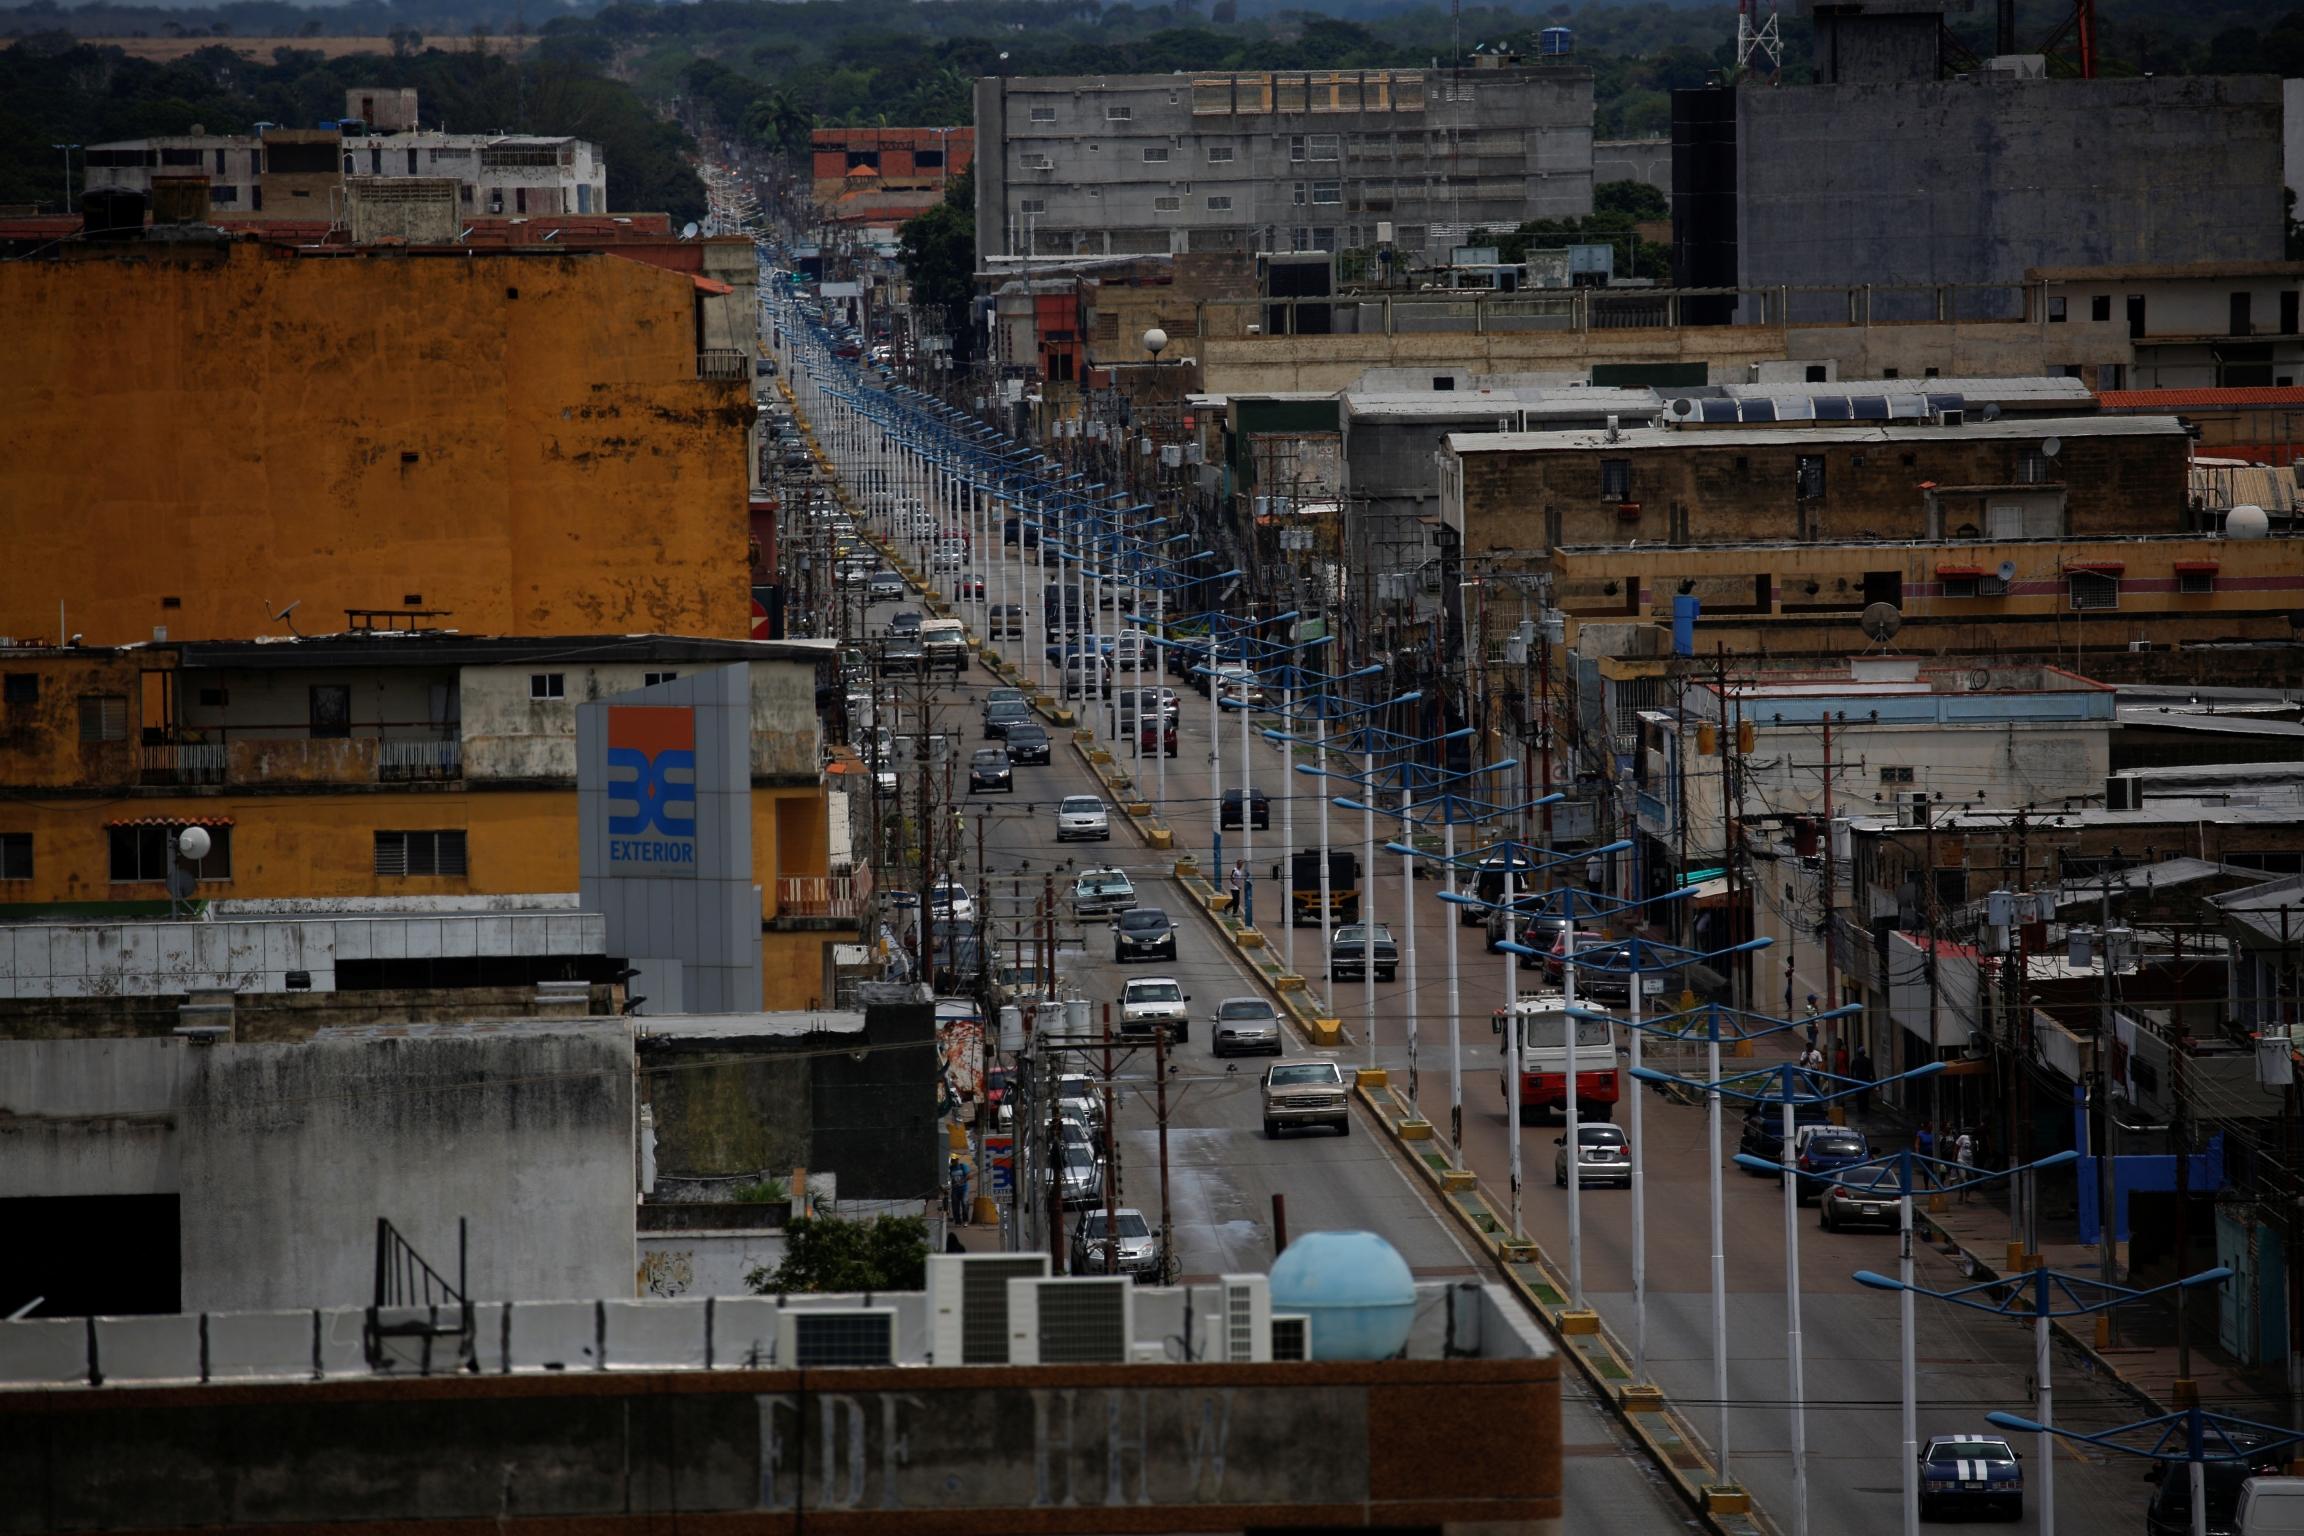 an overhead view of the town of El Tigre, Venezuela